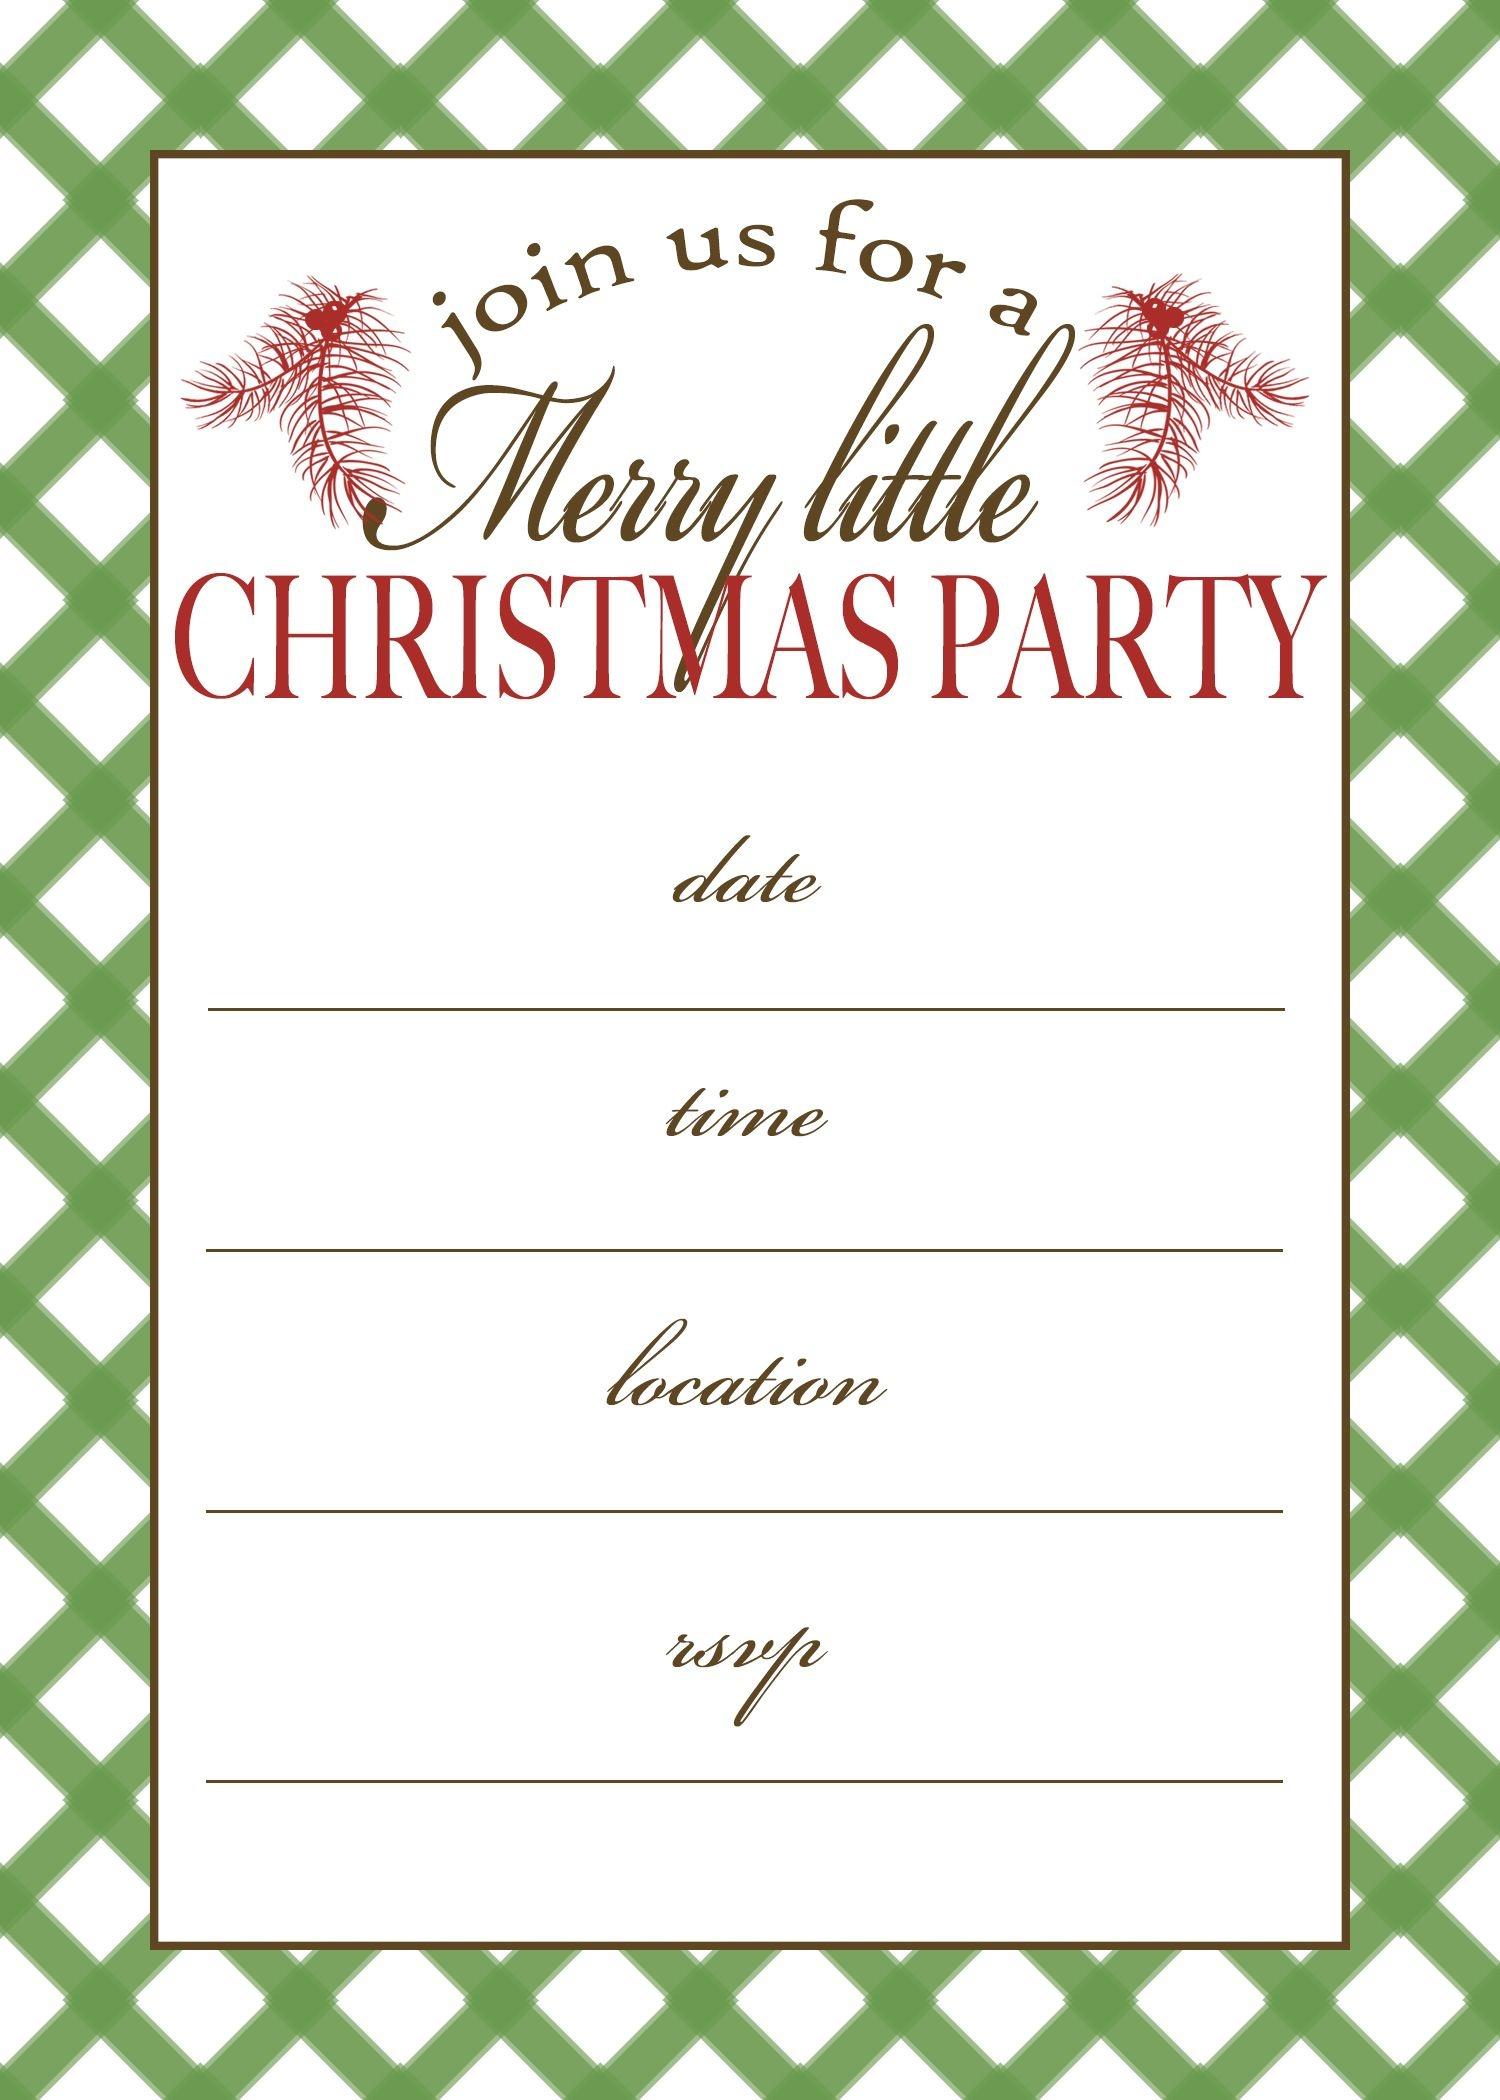 Free Printable Christmas Party Invitation | Crafts | Christmas Party - Christmas Party Invitation Templates Free Printable